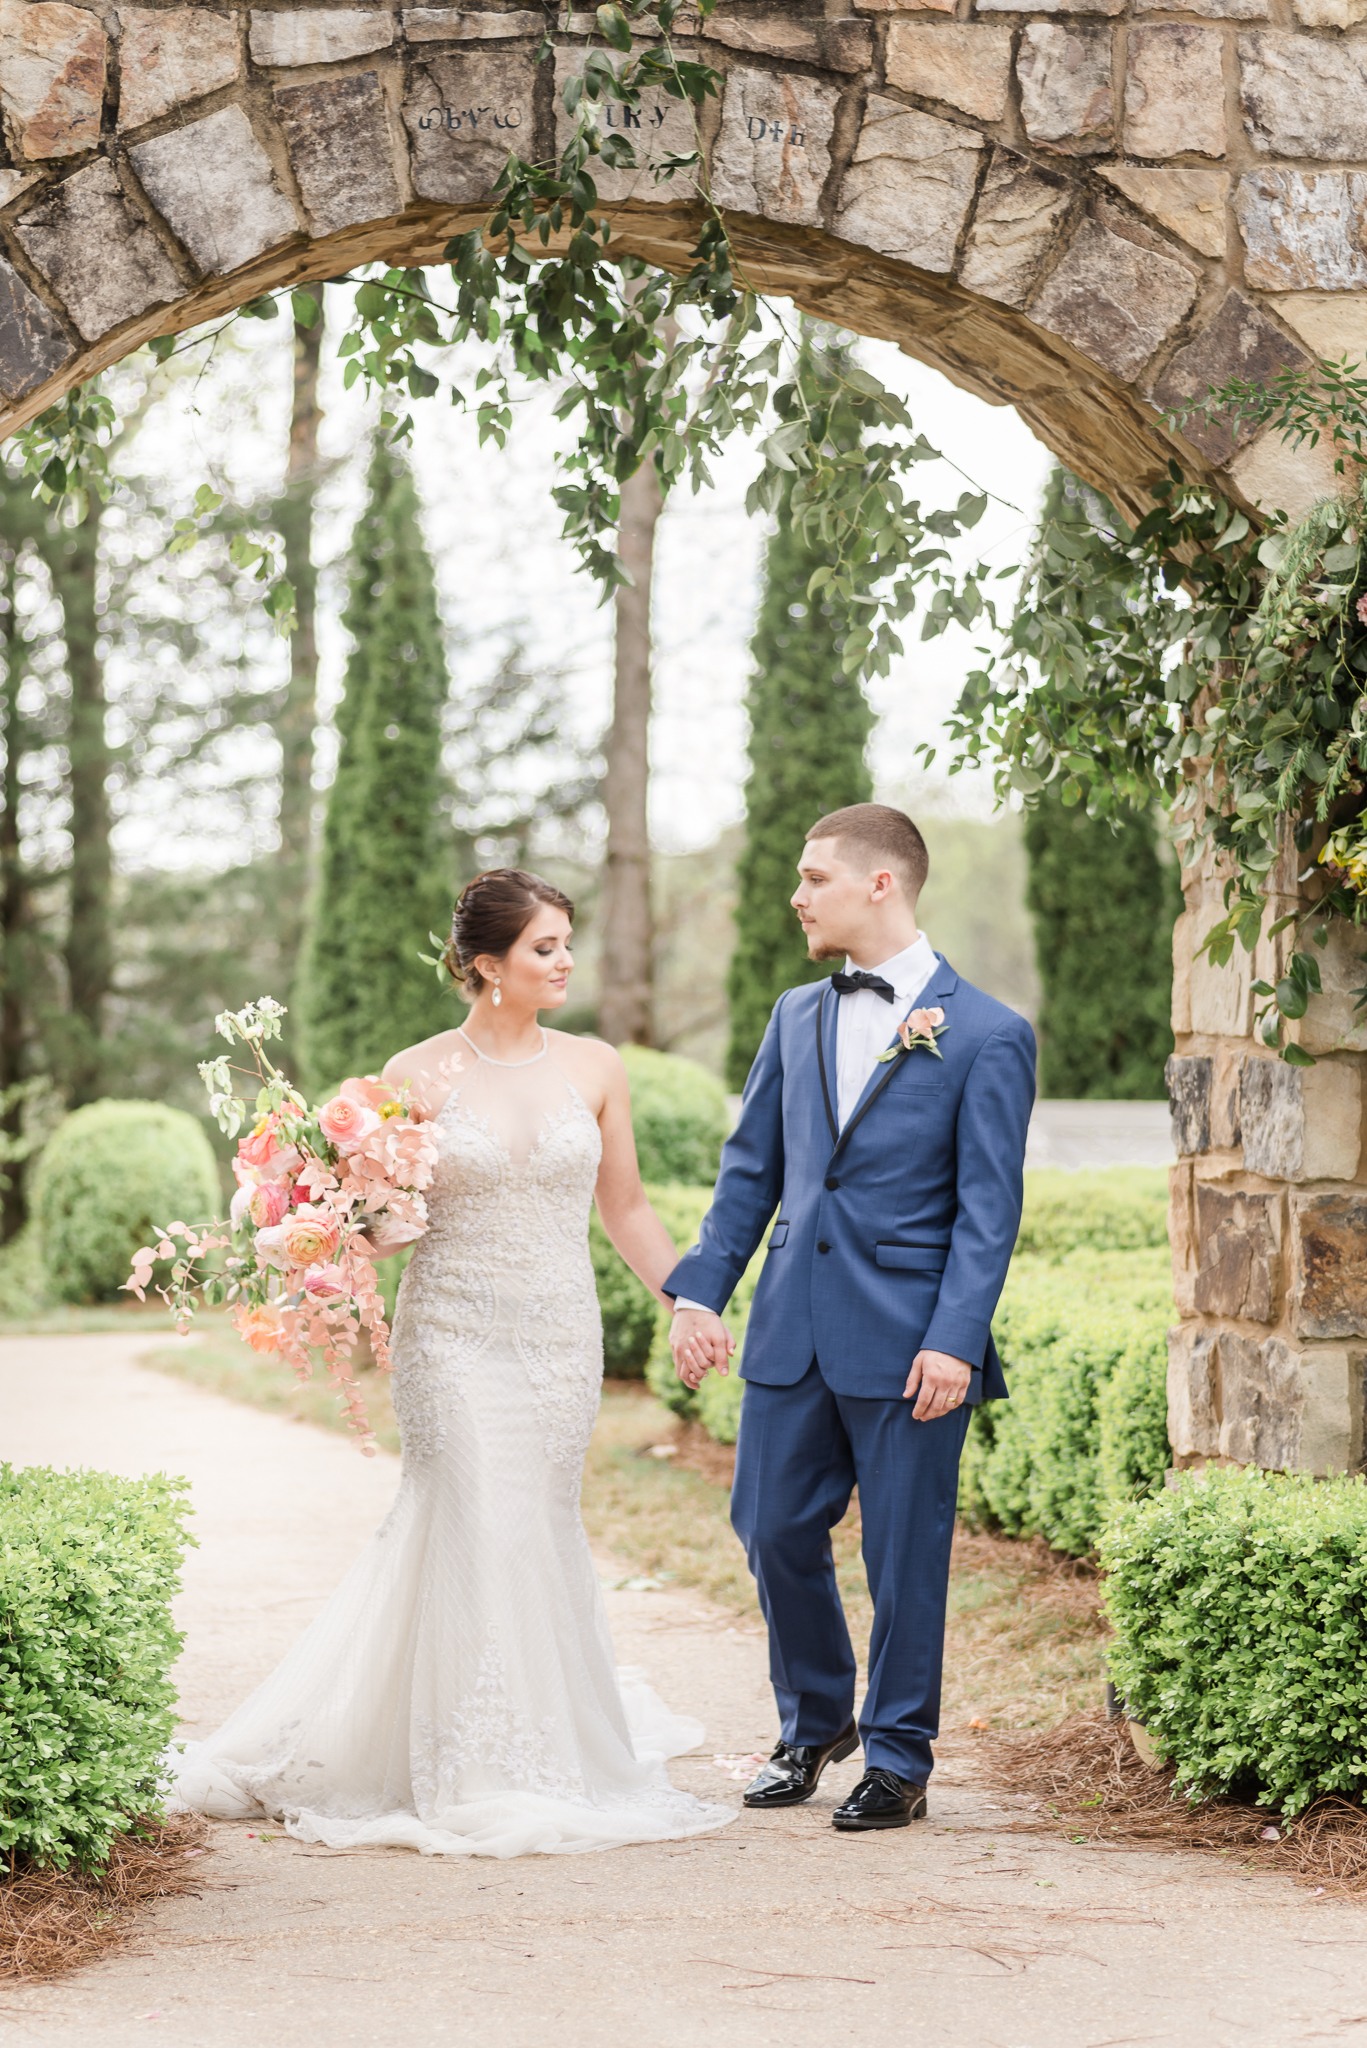 The Best Destination Wedding Photographers-3.jpg